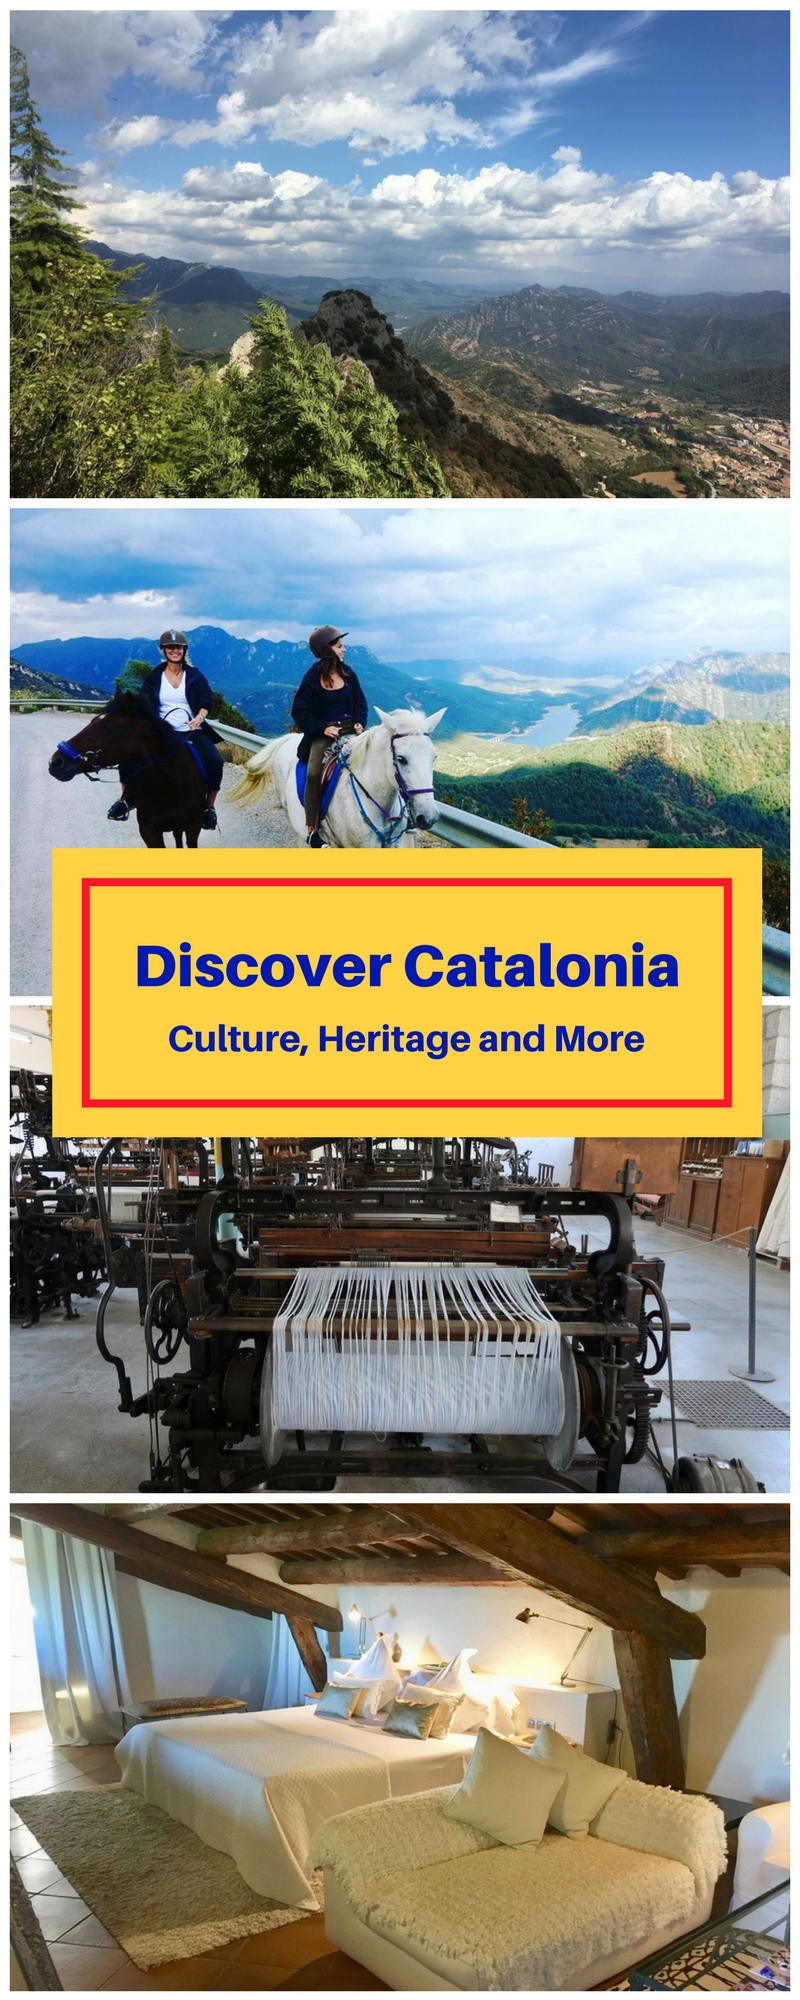 Catalonia or Catalunya - Exploring Catalonia - Discover Catalonia